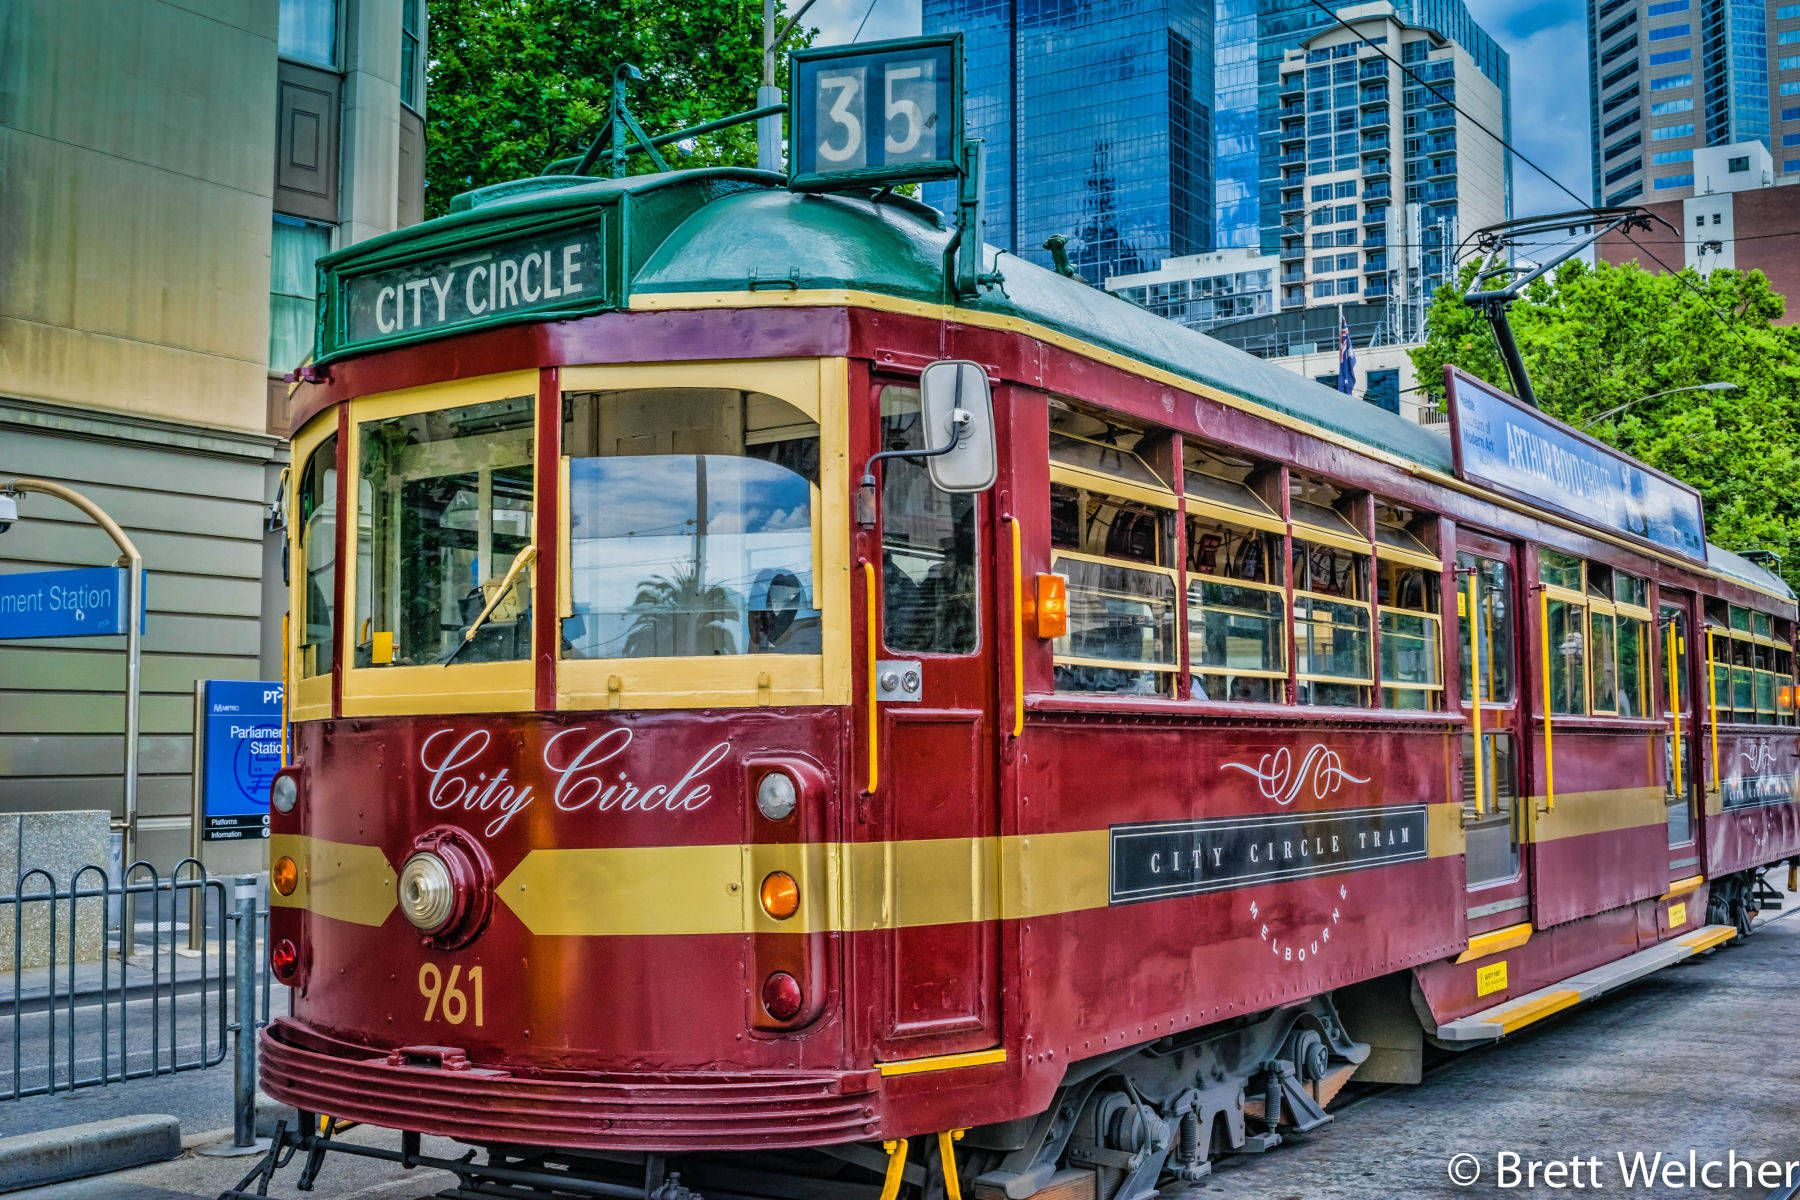 City Circle Tram - Melbourne, Victoria